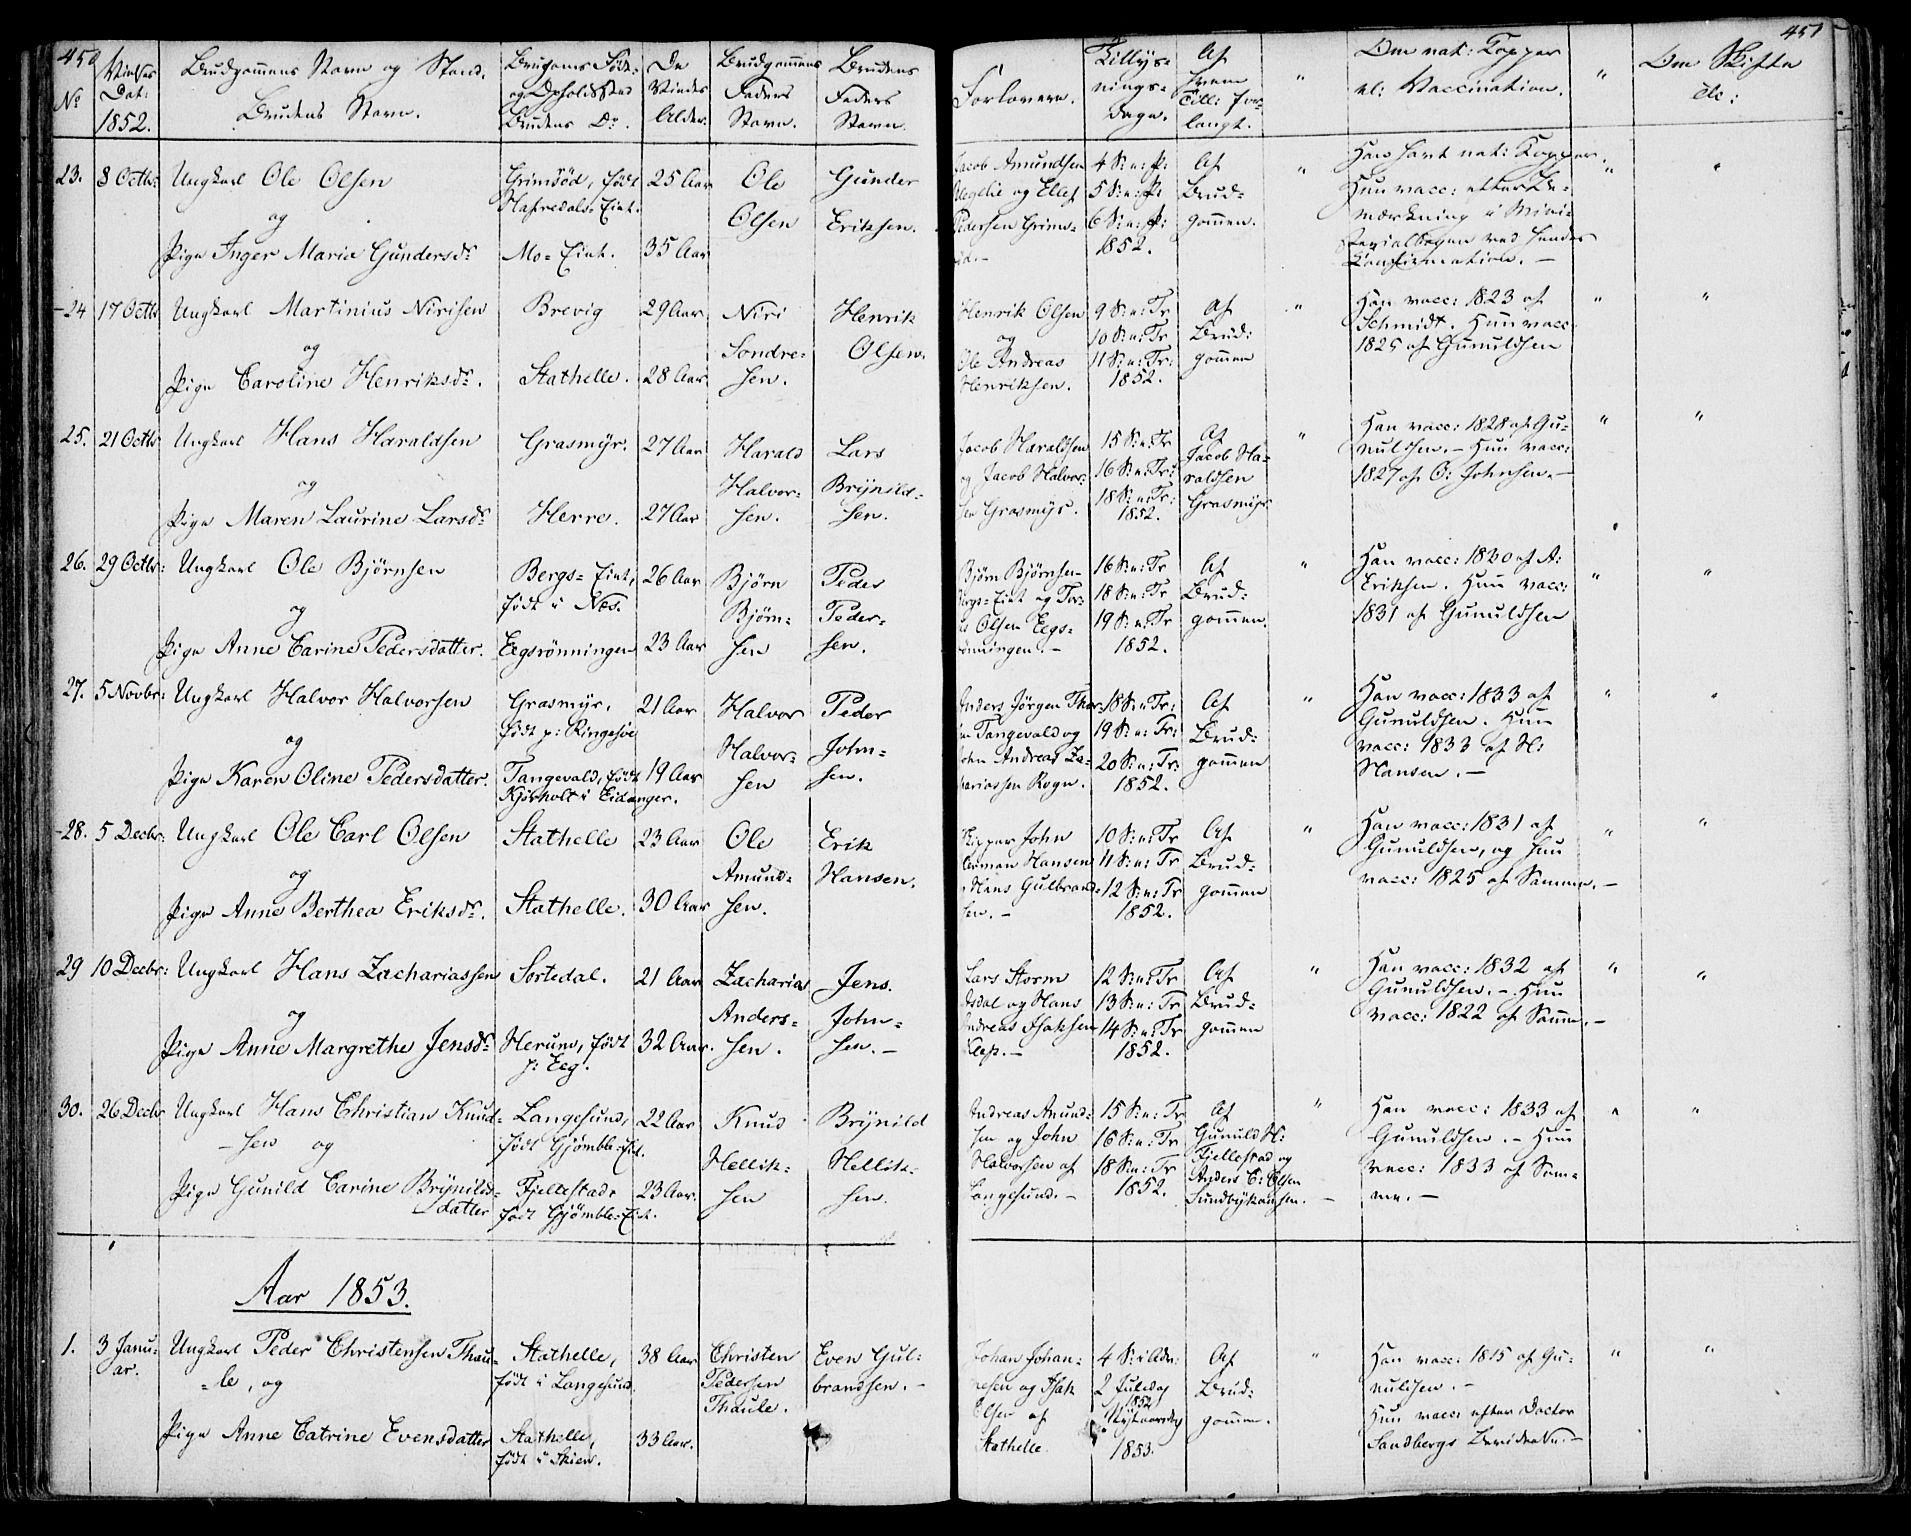 SAKO, Bamble kirkebøker, F/Fa/L0004: Ministerialbok nr. I 4, 1834-1853, s. 450-451